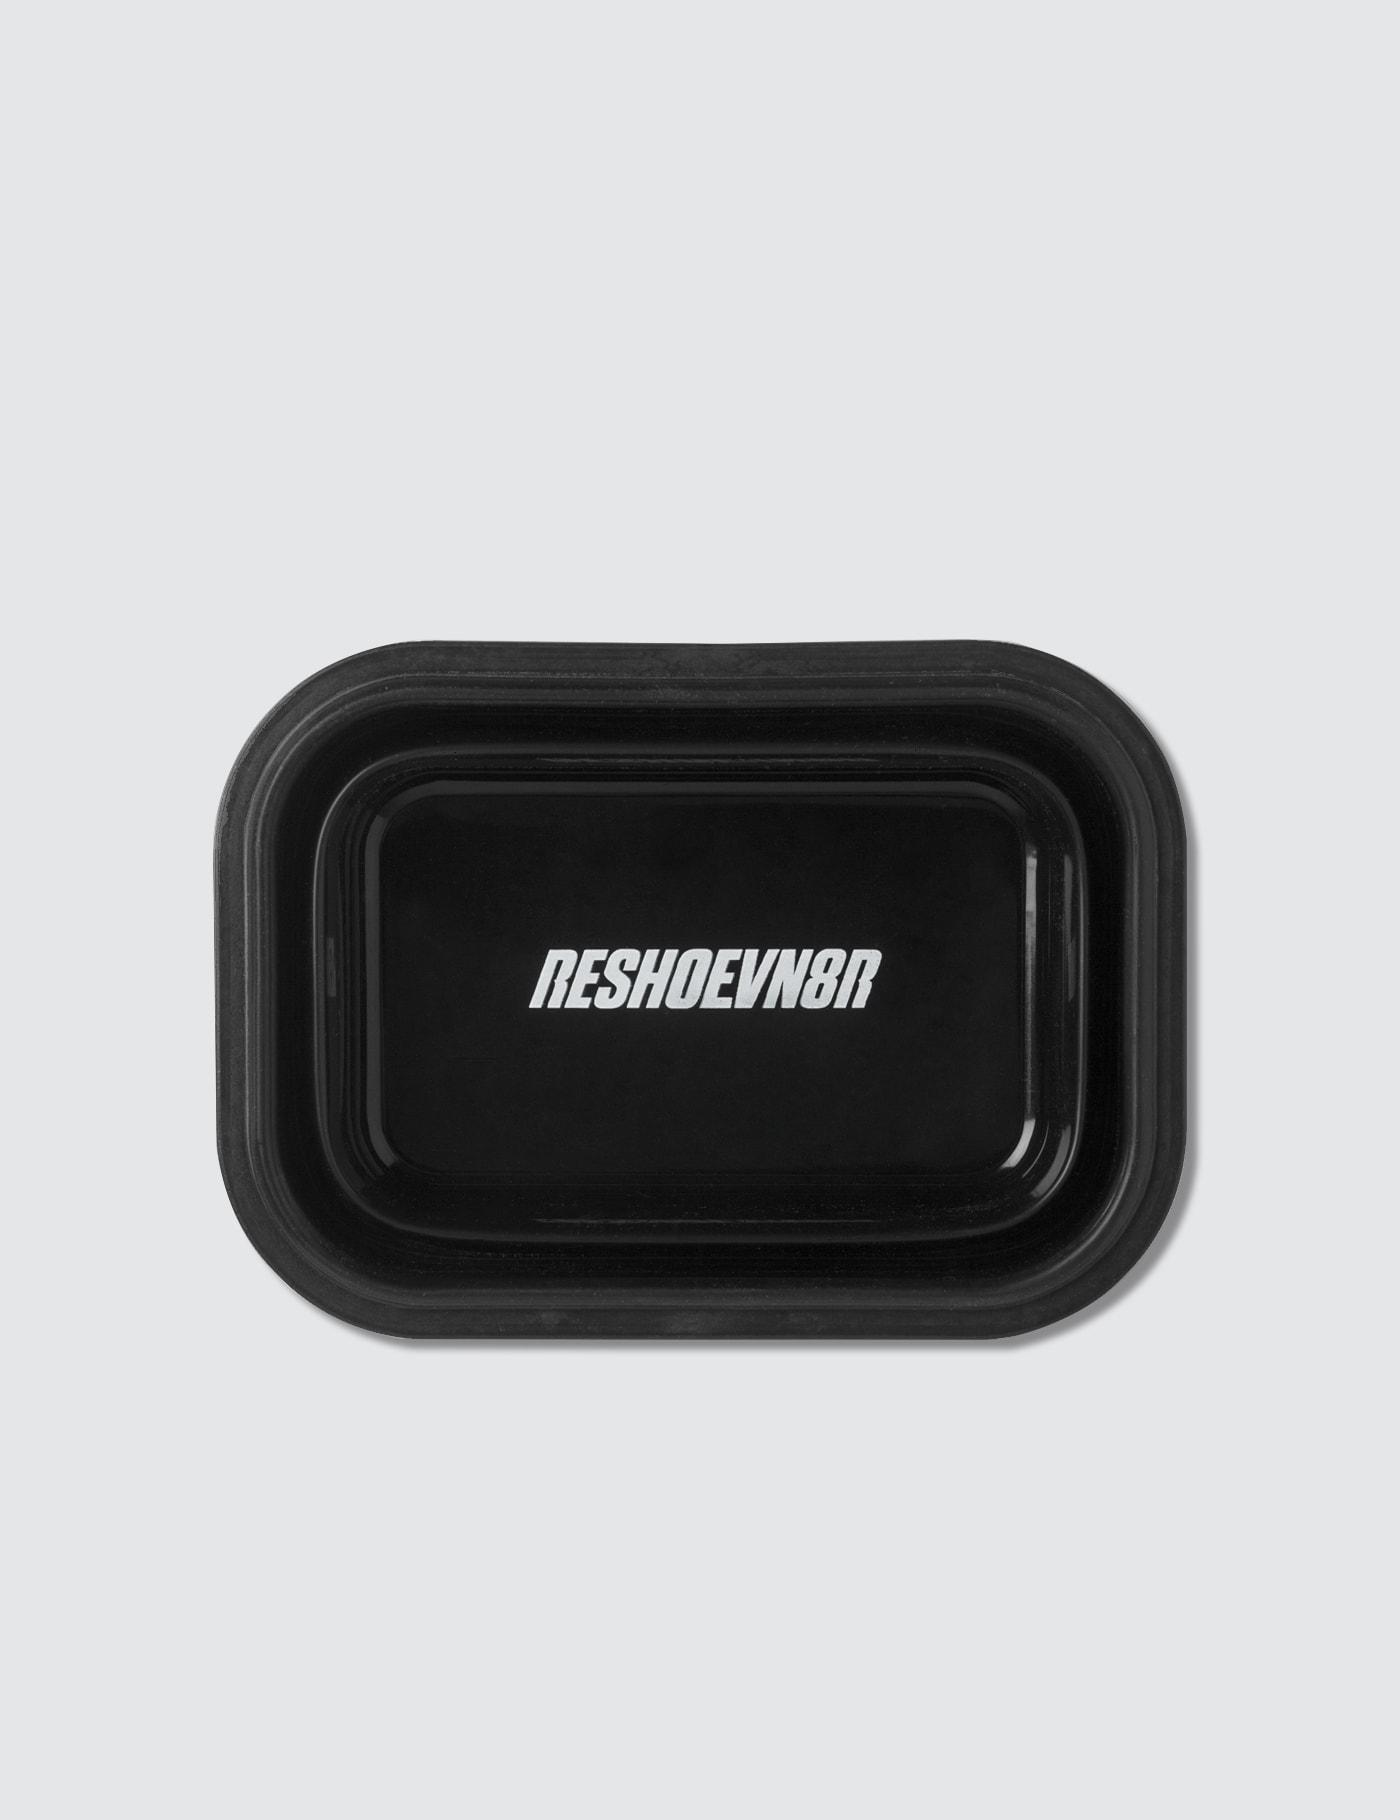 Reshoevn8r硅胶调配盆FREE